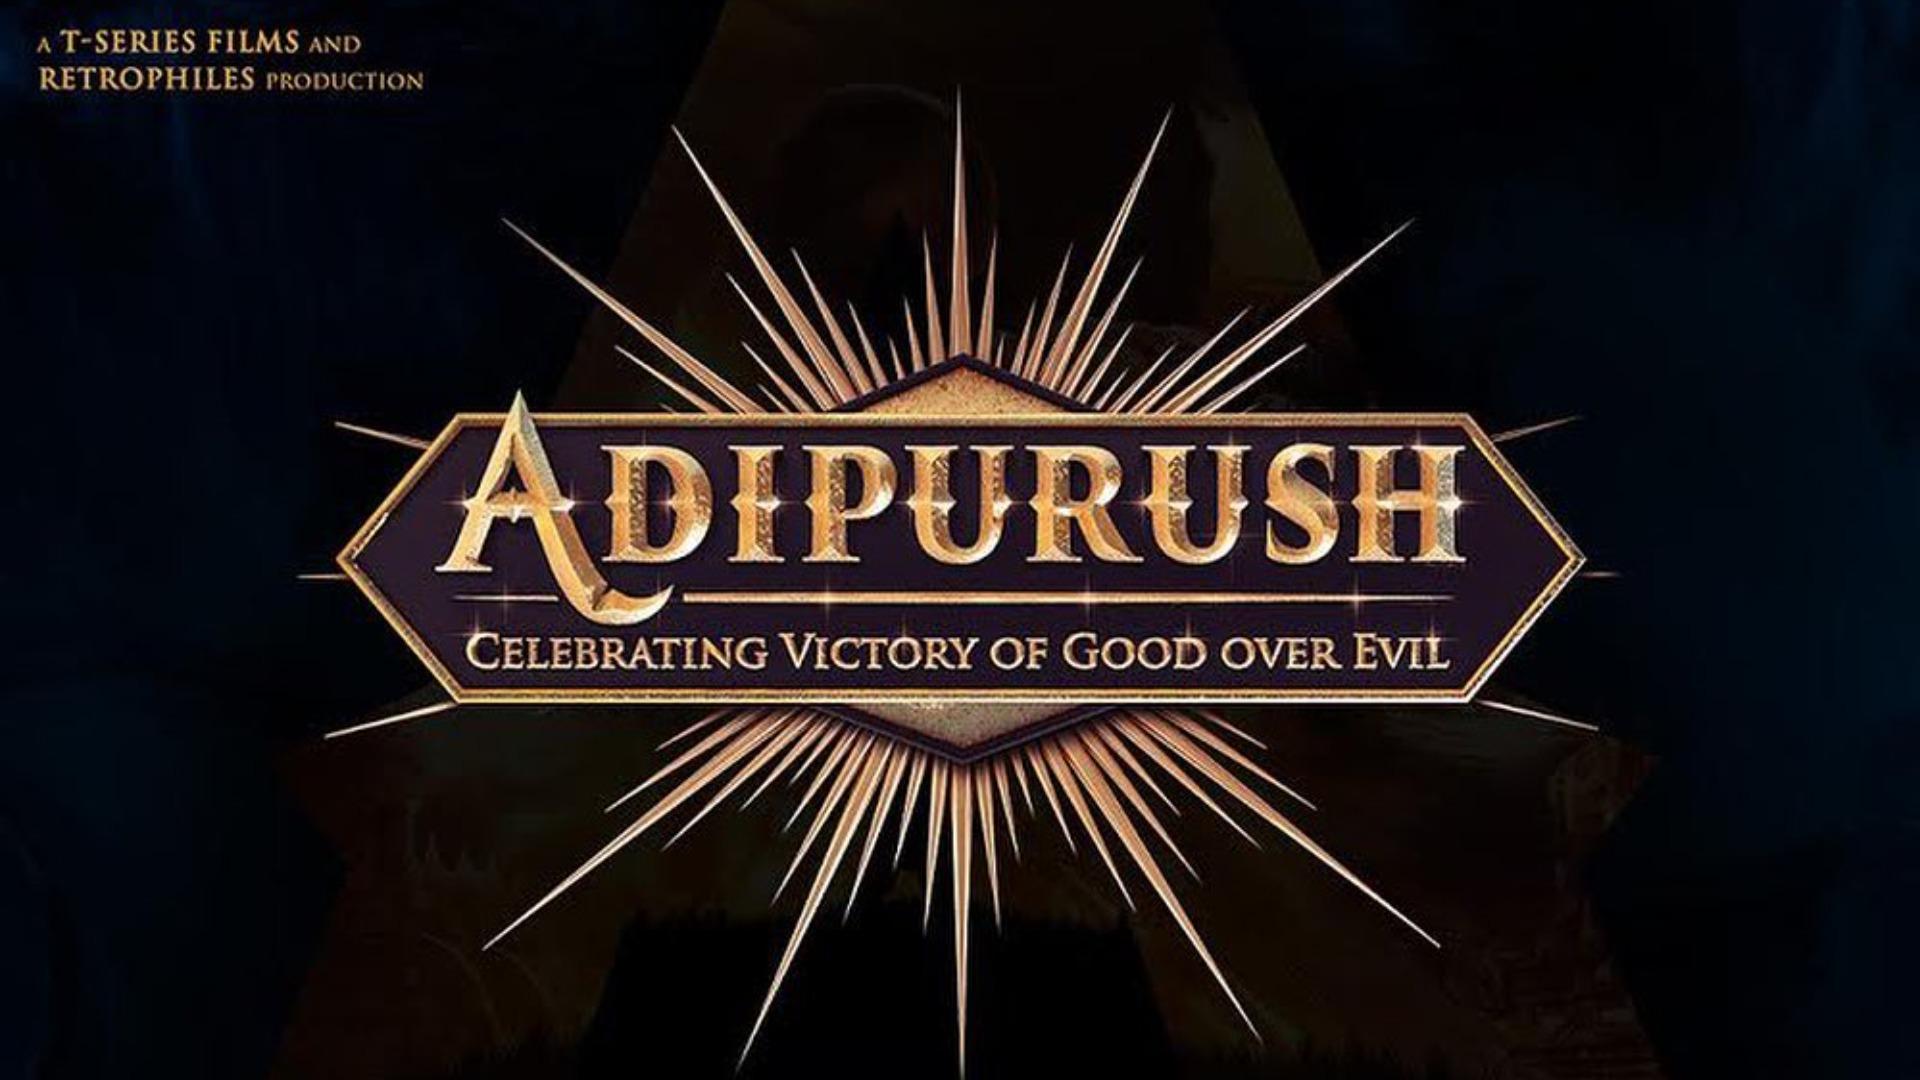 Bahubali Actor Prabhas Takes Rs 150 Crores Remuneration For Adipurush